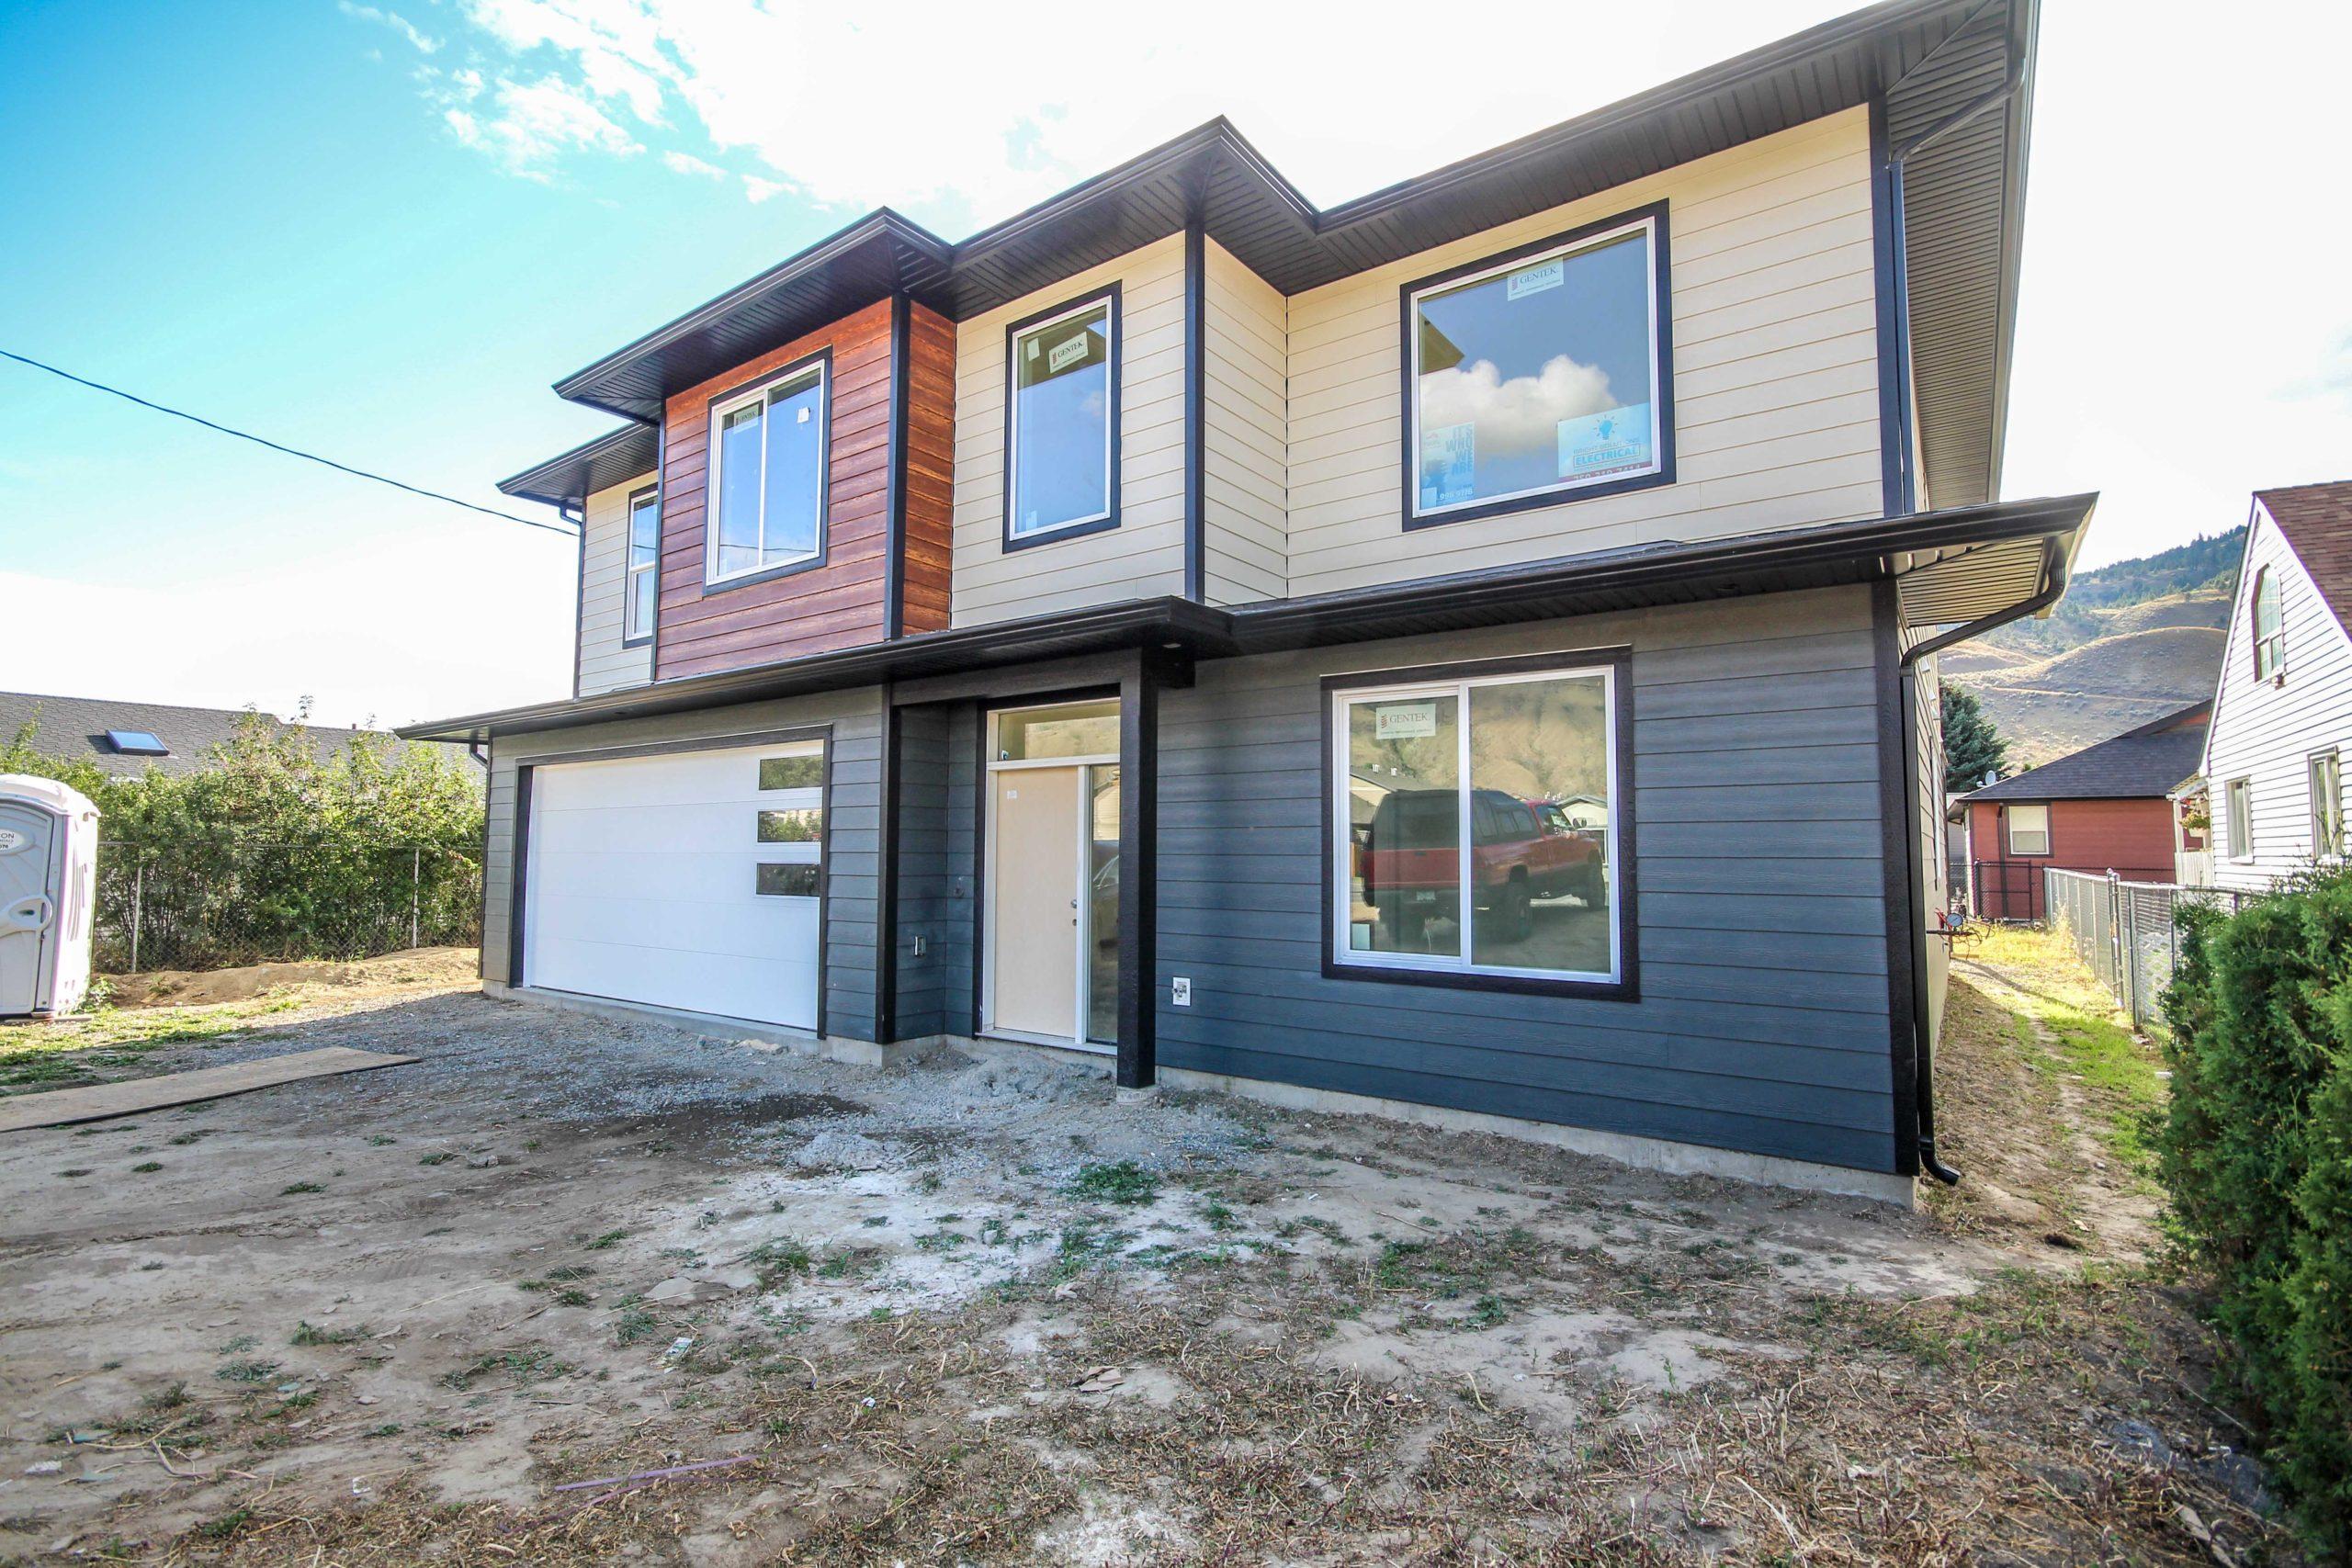 3048 Westsyde Rd, Westsyde, Kamloops Real Estate for Sale